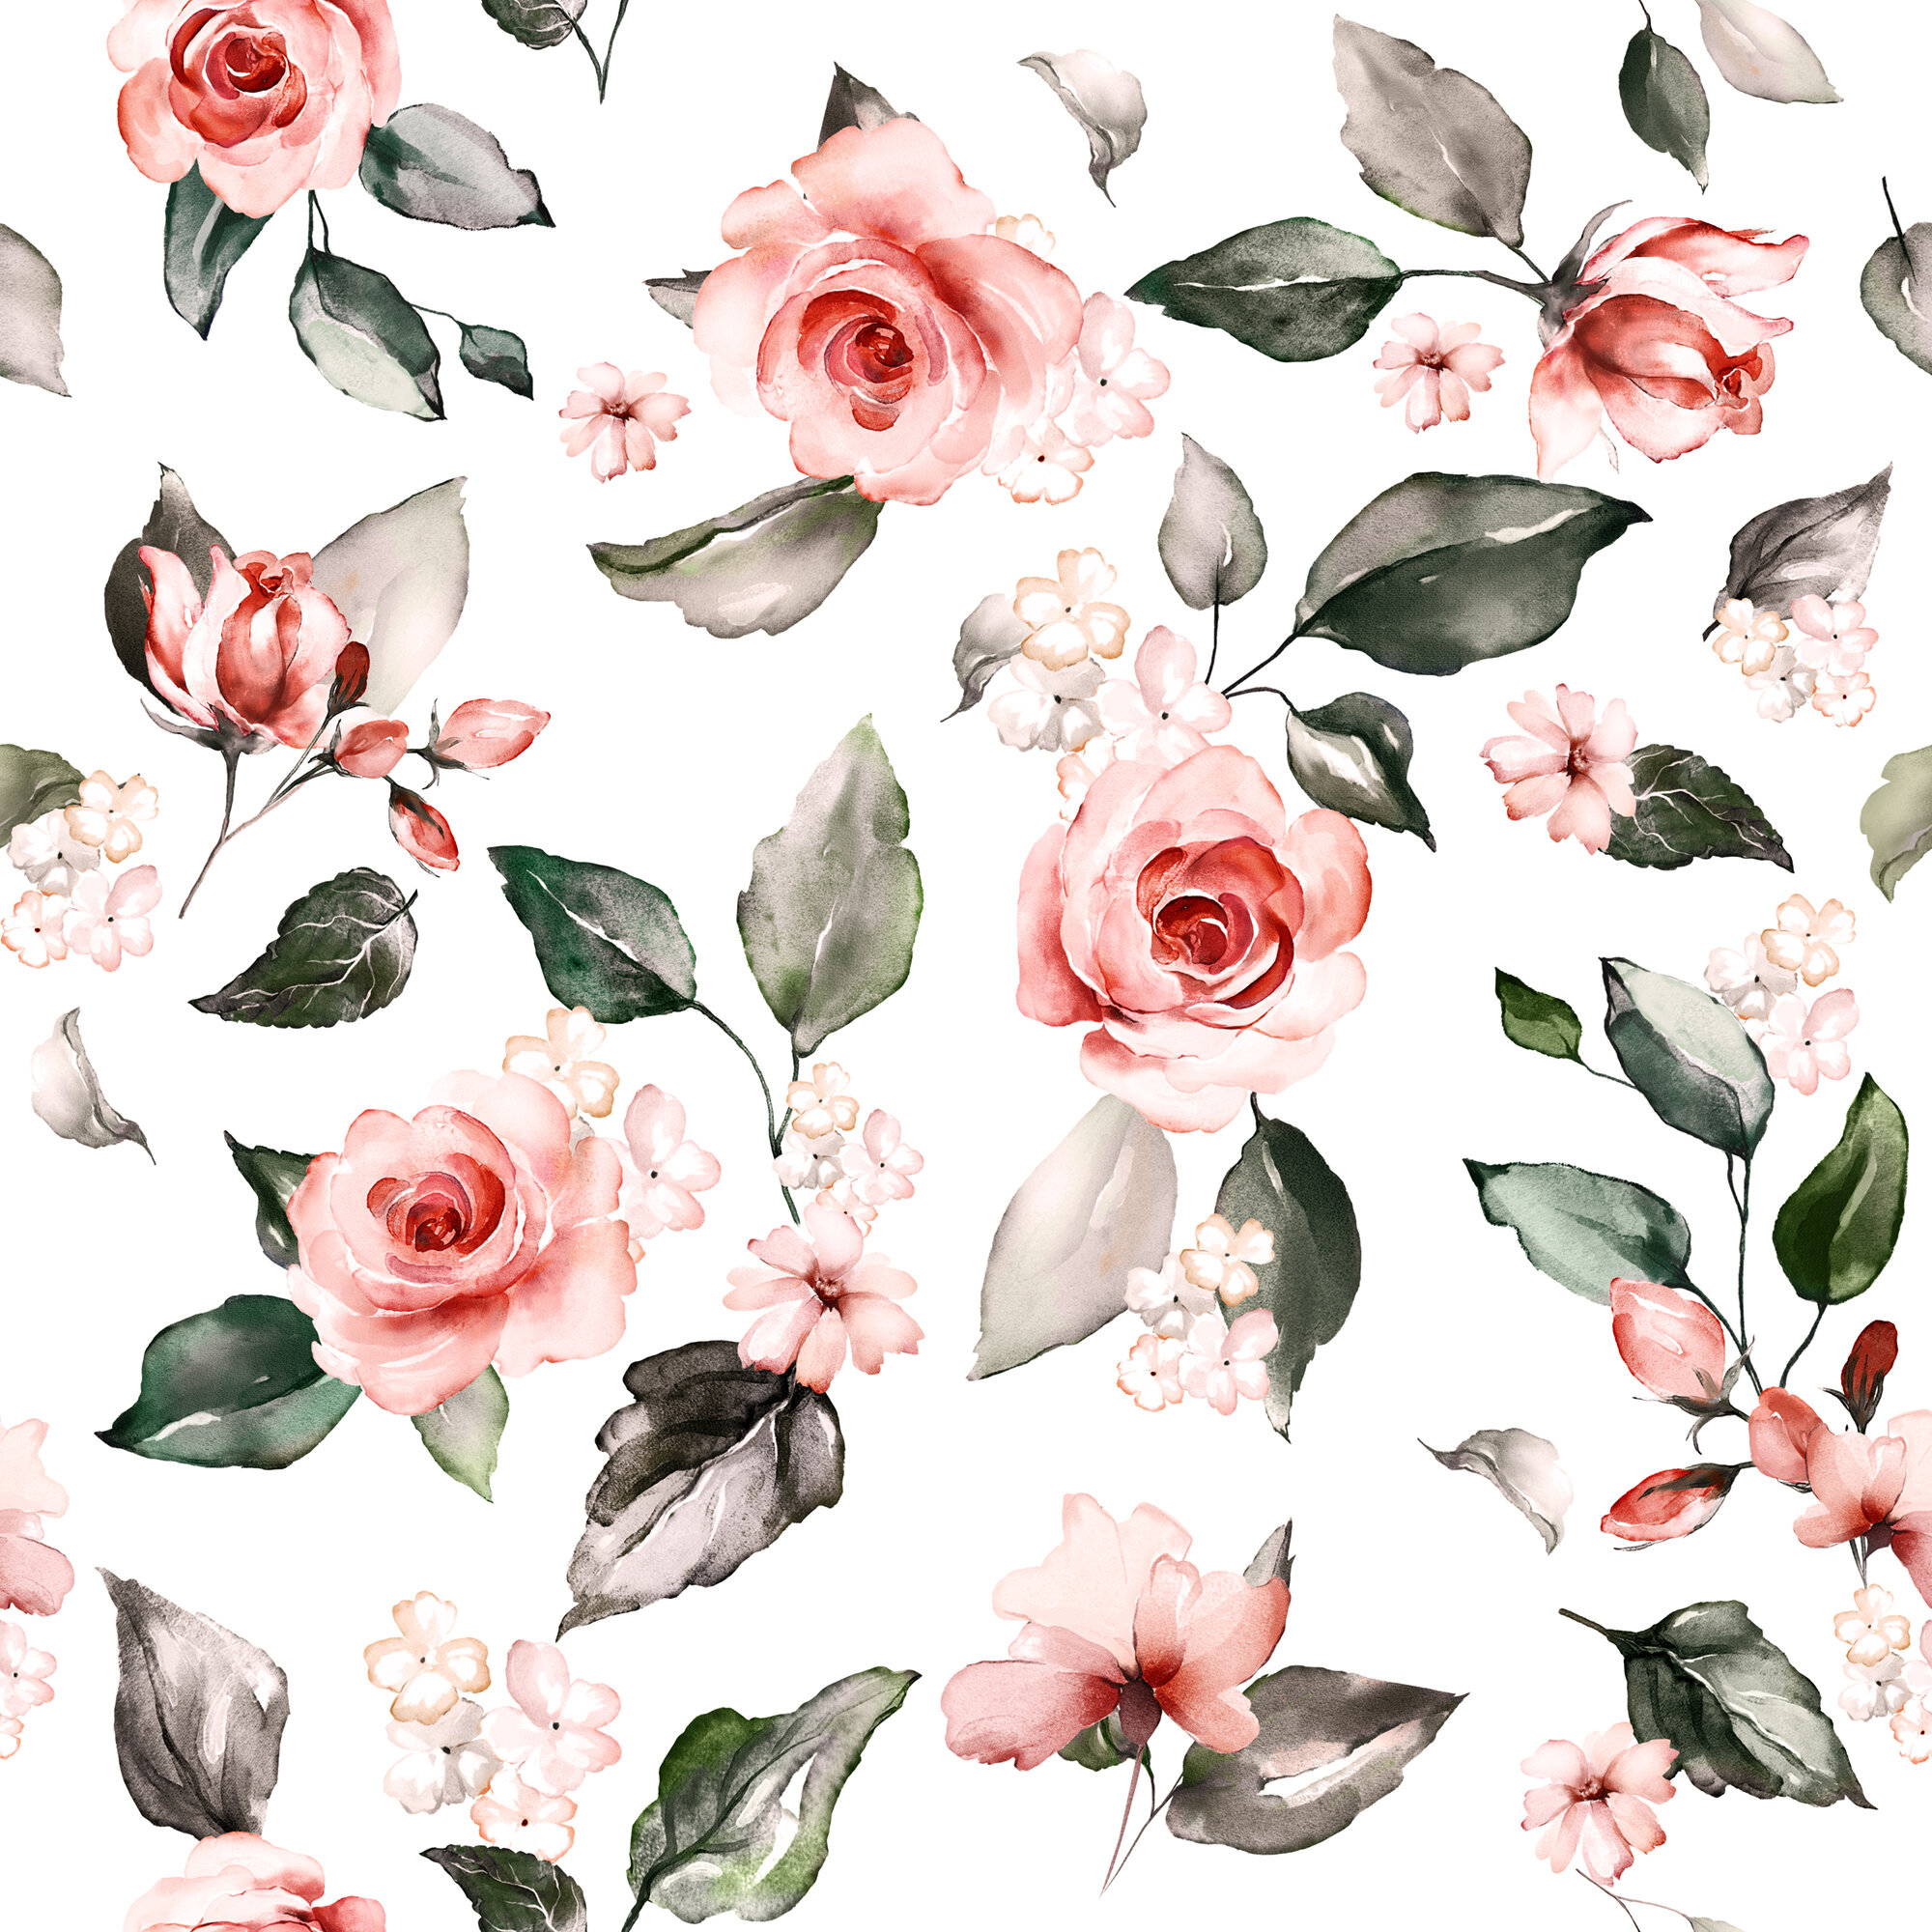 August Grove Garden Watercolor Roses 10 L X 24 W Peel And Stick Wallpaper Roll Wayfair